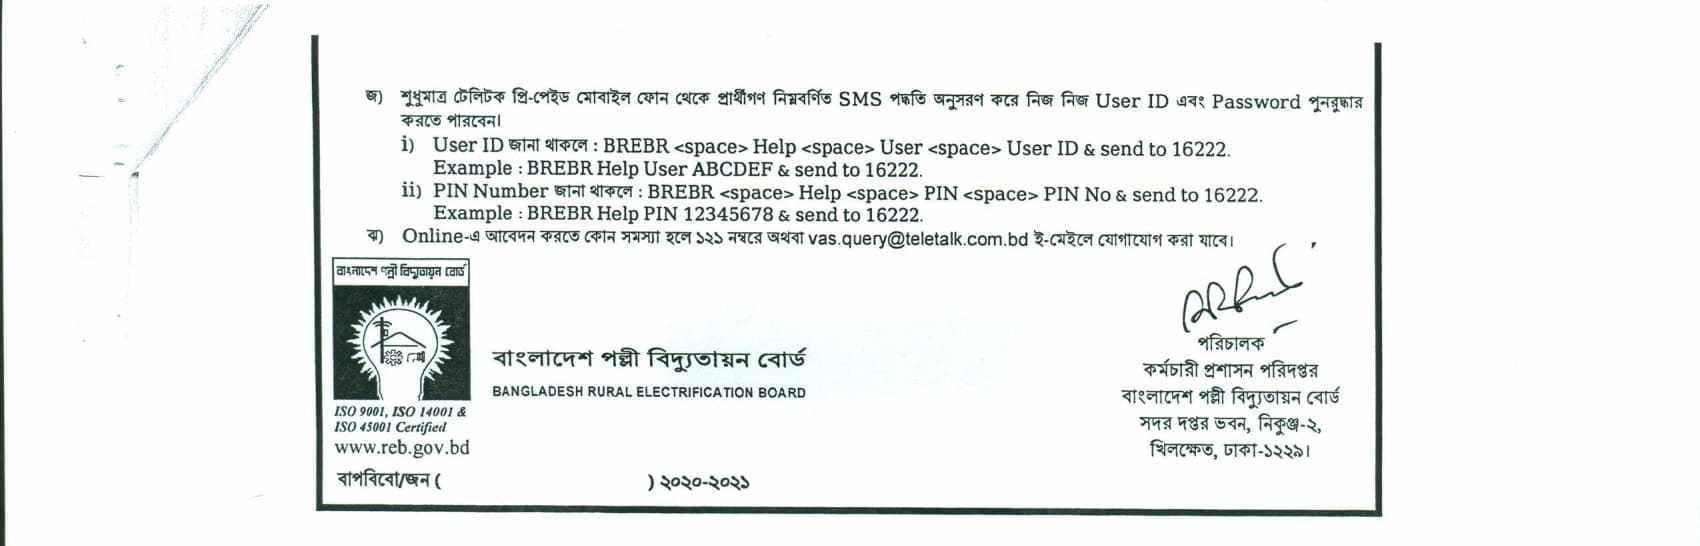 BREBR Teletalk com bd apply